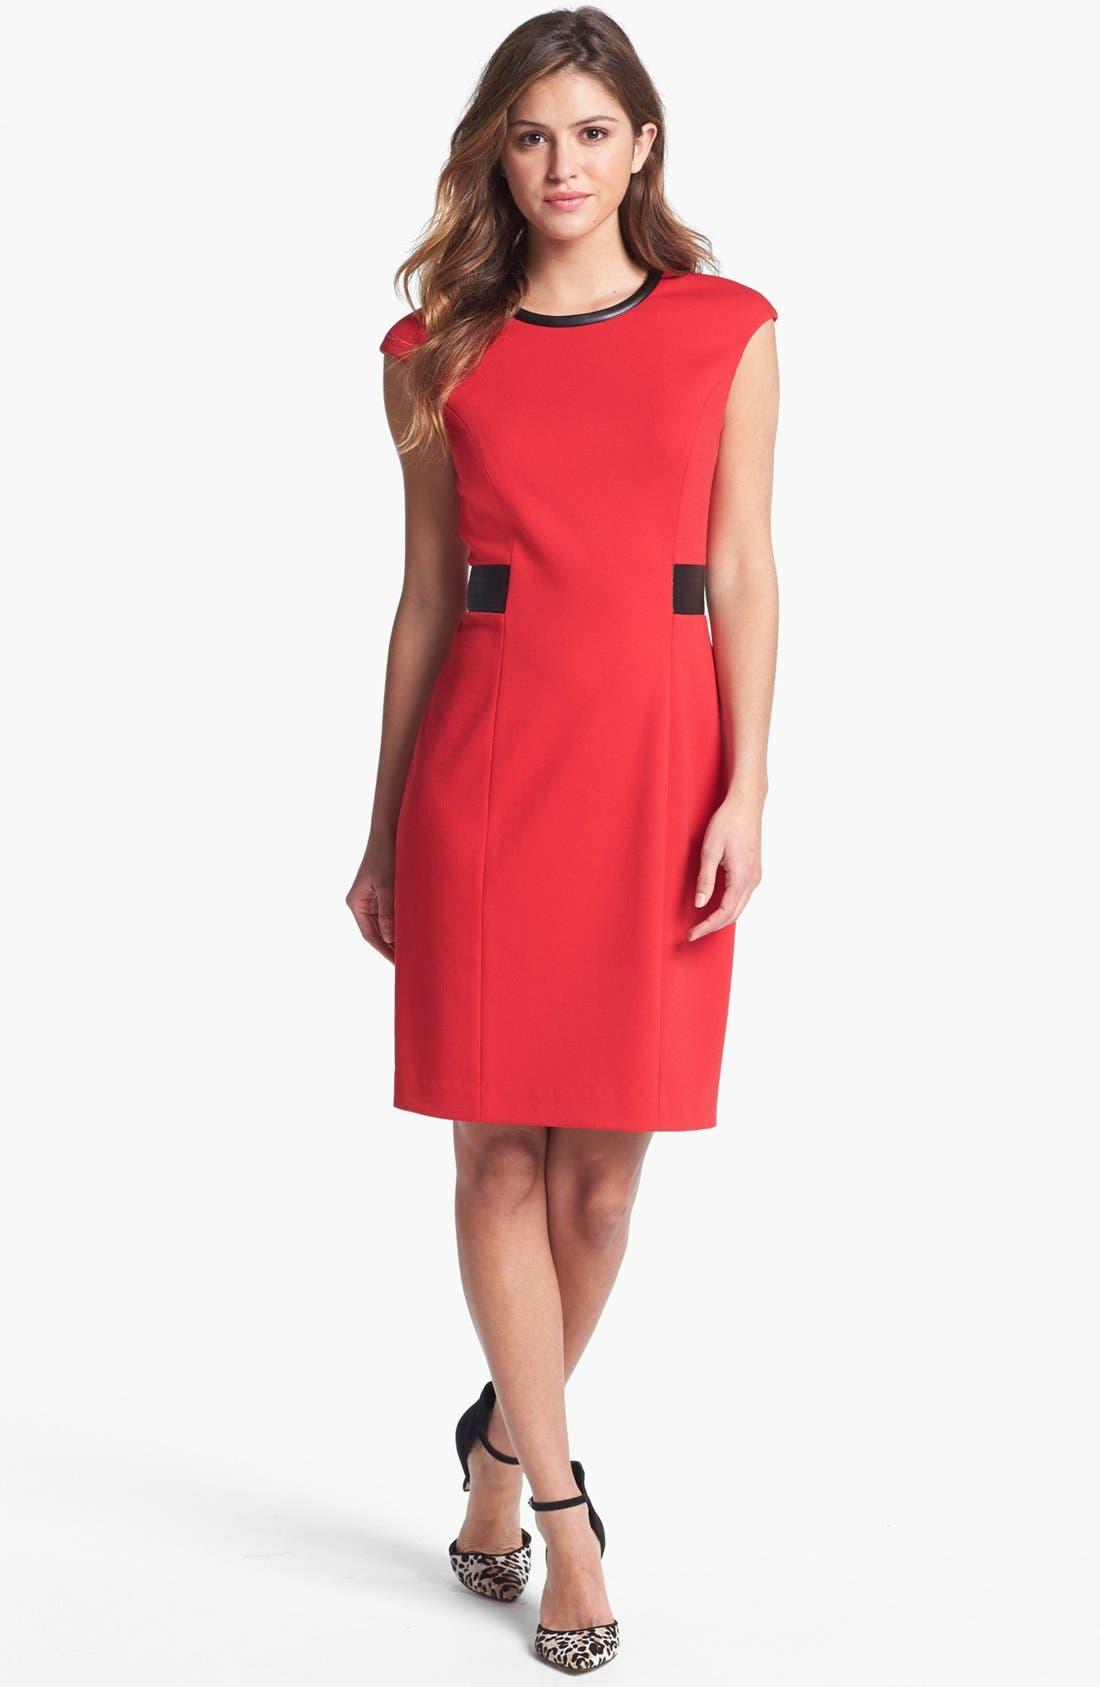 Main Image - Calvin Klein Faux Leather Trim Ponte Sheath Dress (Petite)